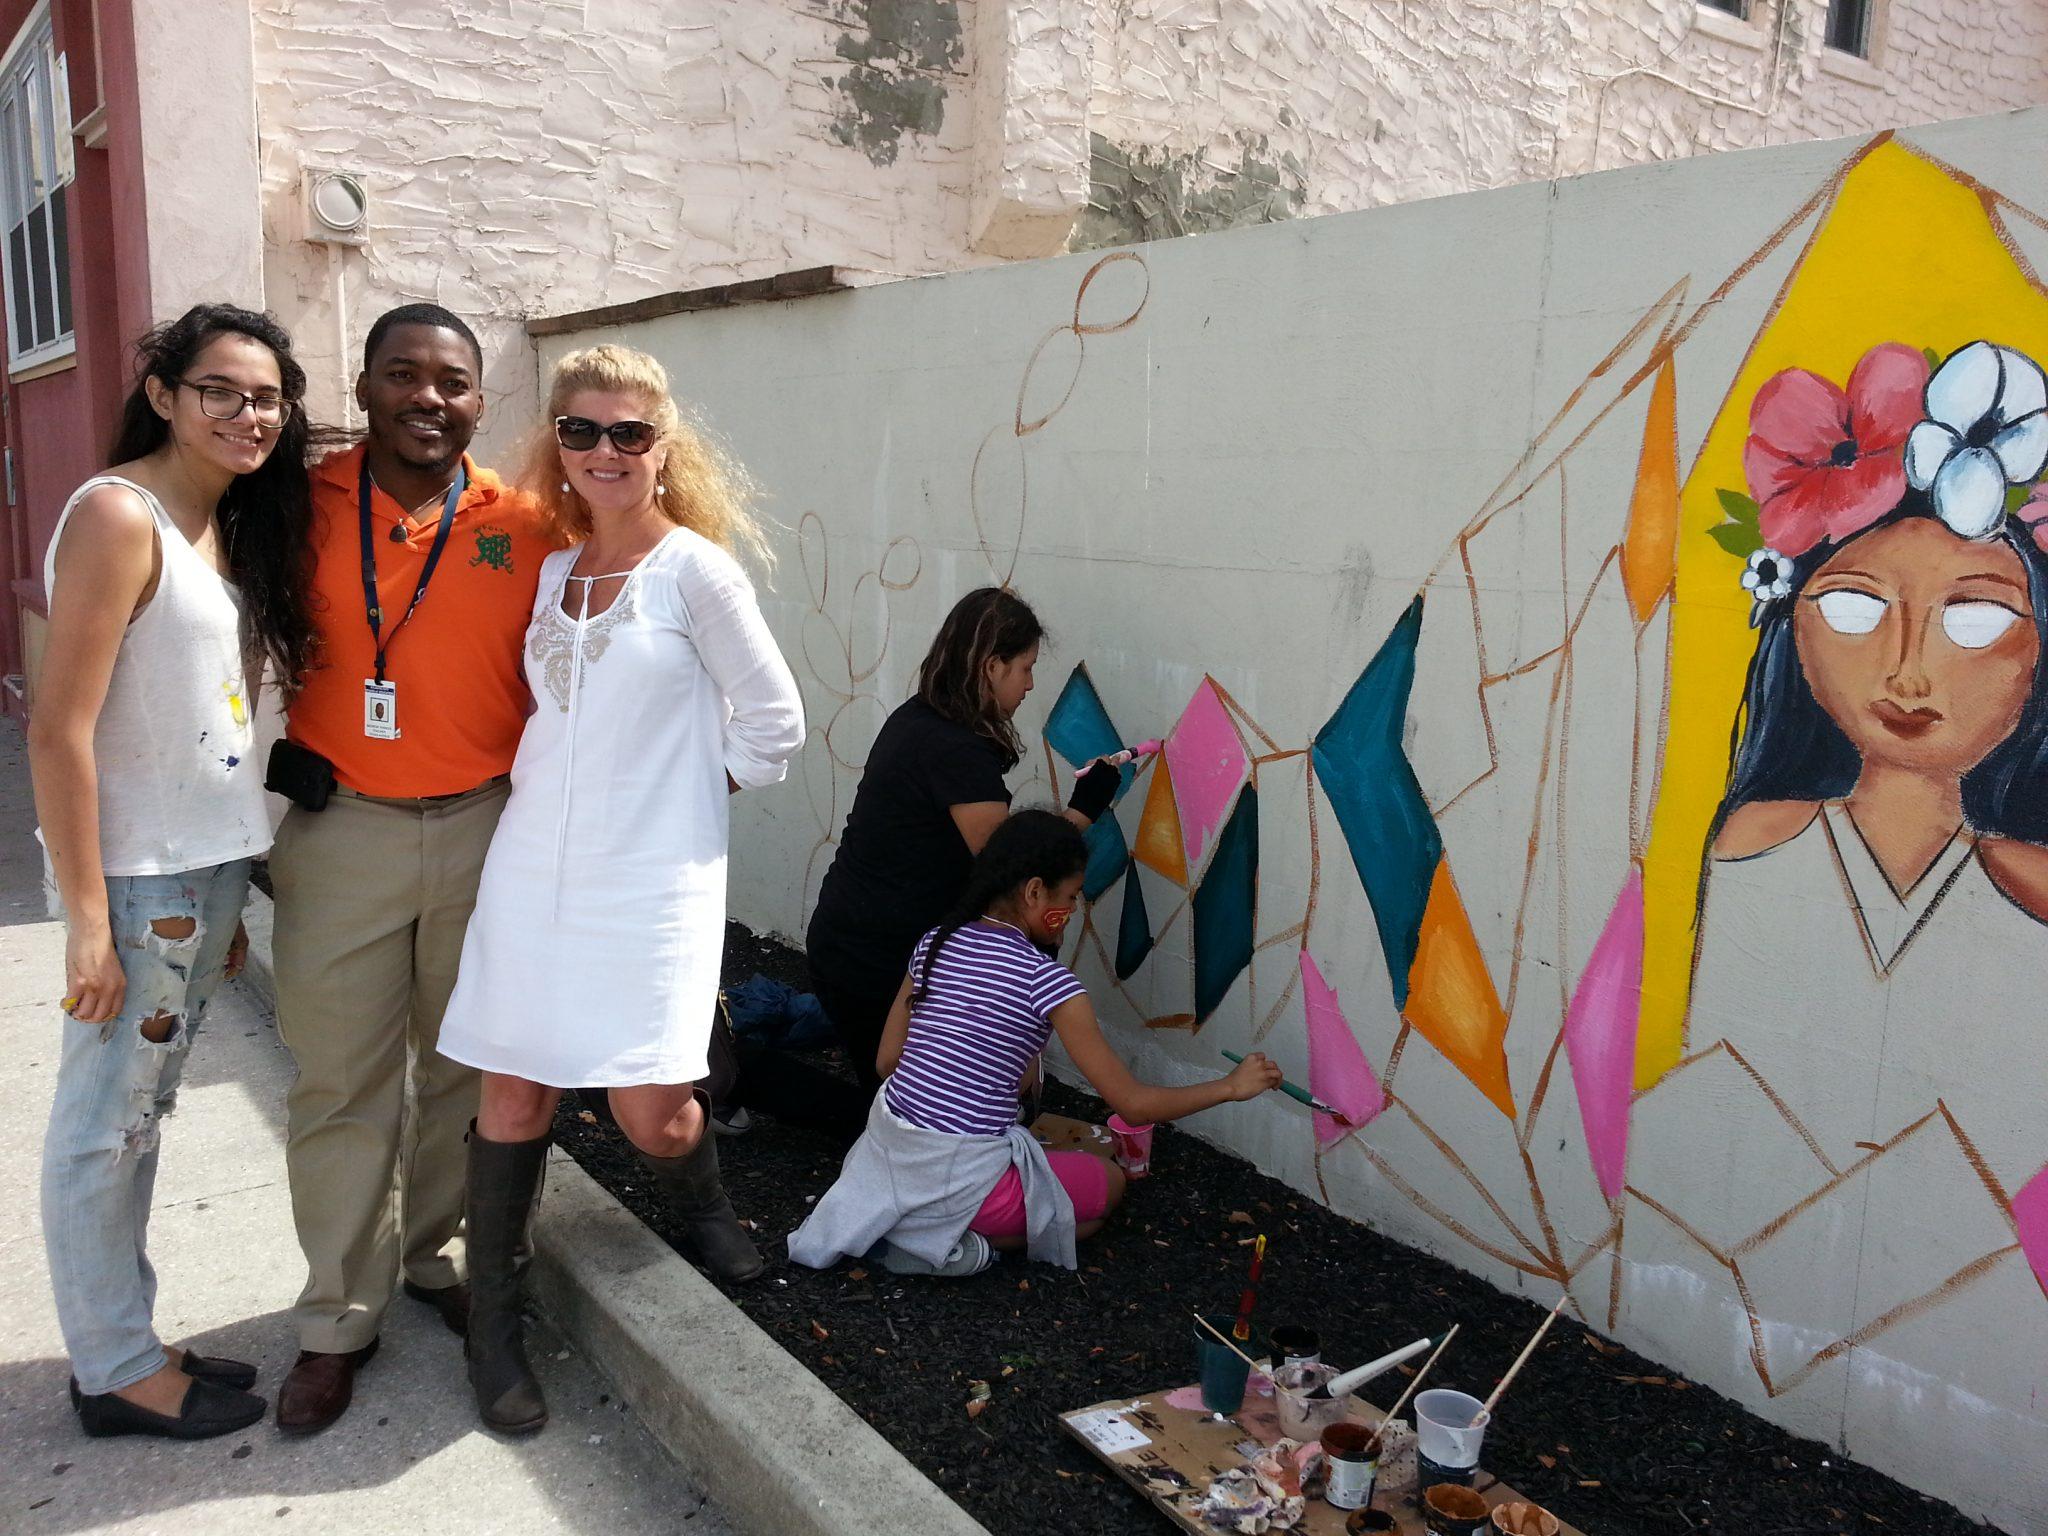 Georgia Avenue Mural - Artist Manuela Guillen, Teacher Andrew Parker, Atlantic City Arts Commission Chairwoman Donna Marie Shea, Texas Avenue School Students